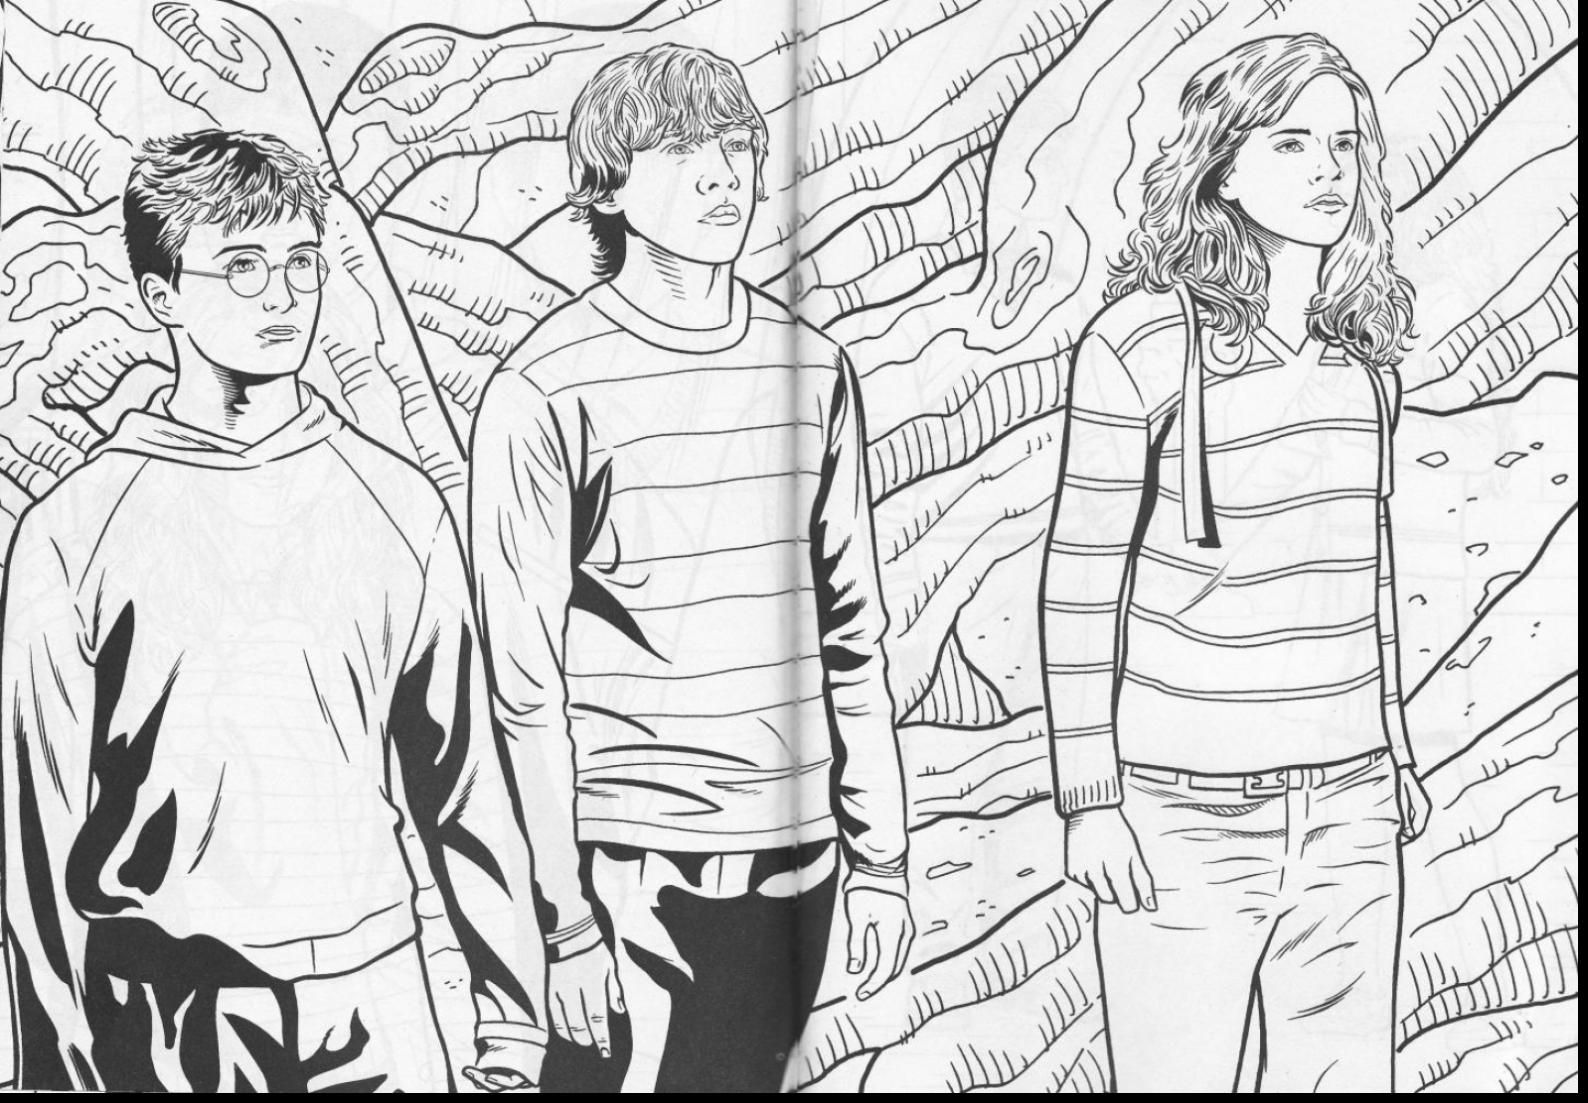 Outstanding Voldemort Vs Harry Potter Colouring Pages Page With Harry Potter Colorin Harry Potter Coloring Pages Harry Potter Colors Harry Potter Coloring Book